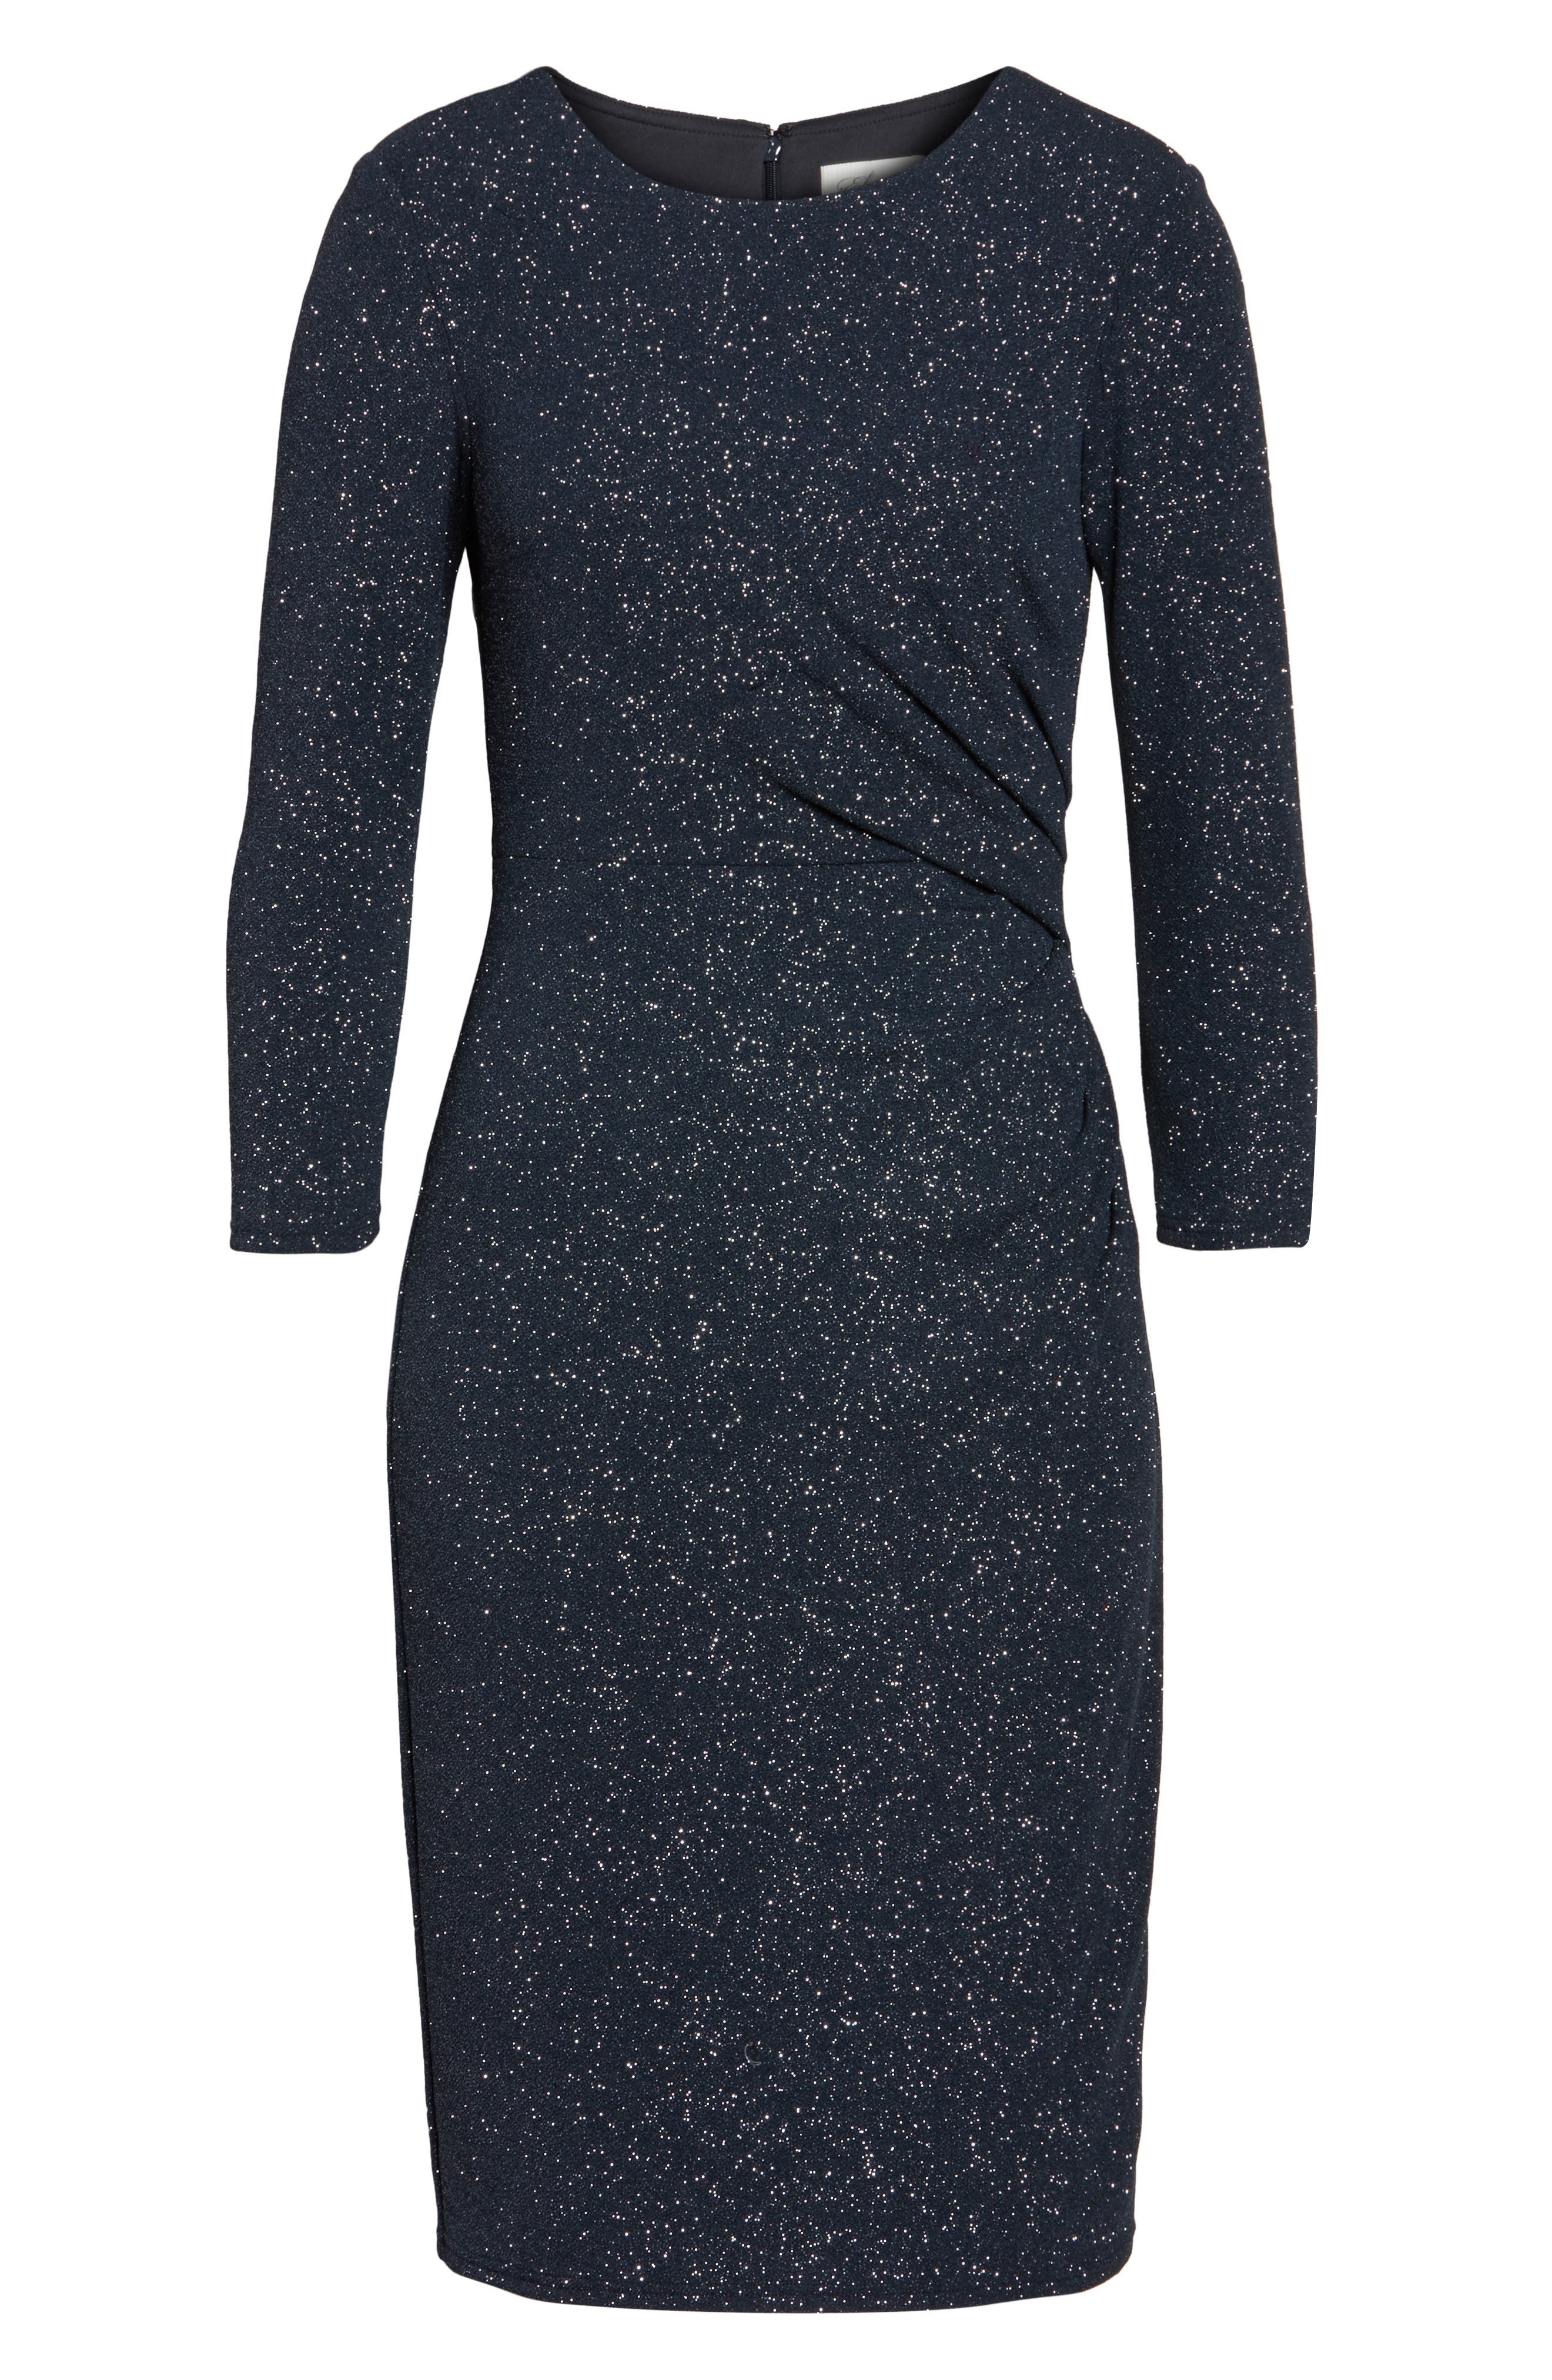 Gathered Sheath Dress,                             Alternate thumbnail 6, color,                             030